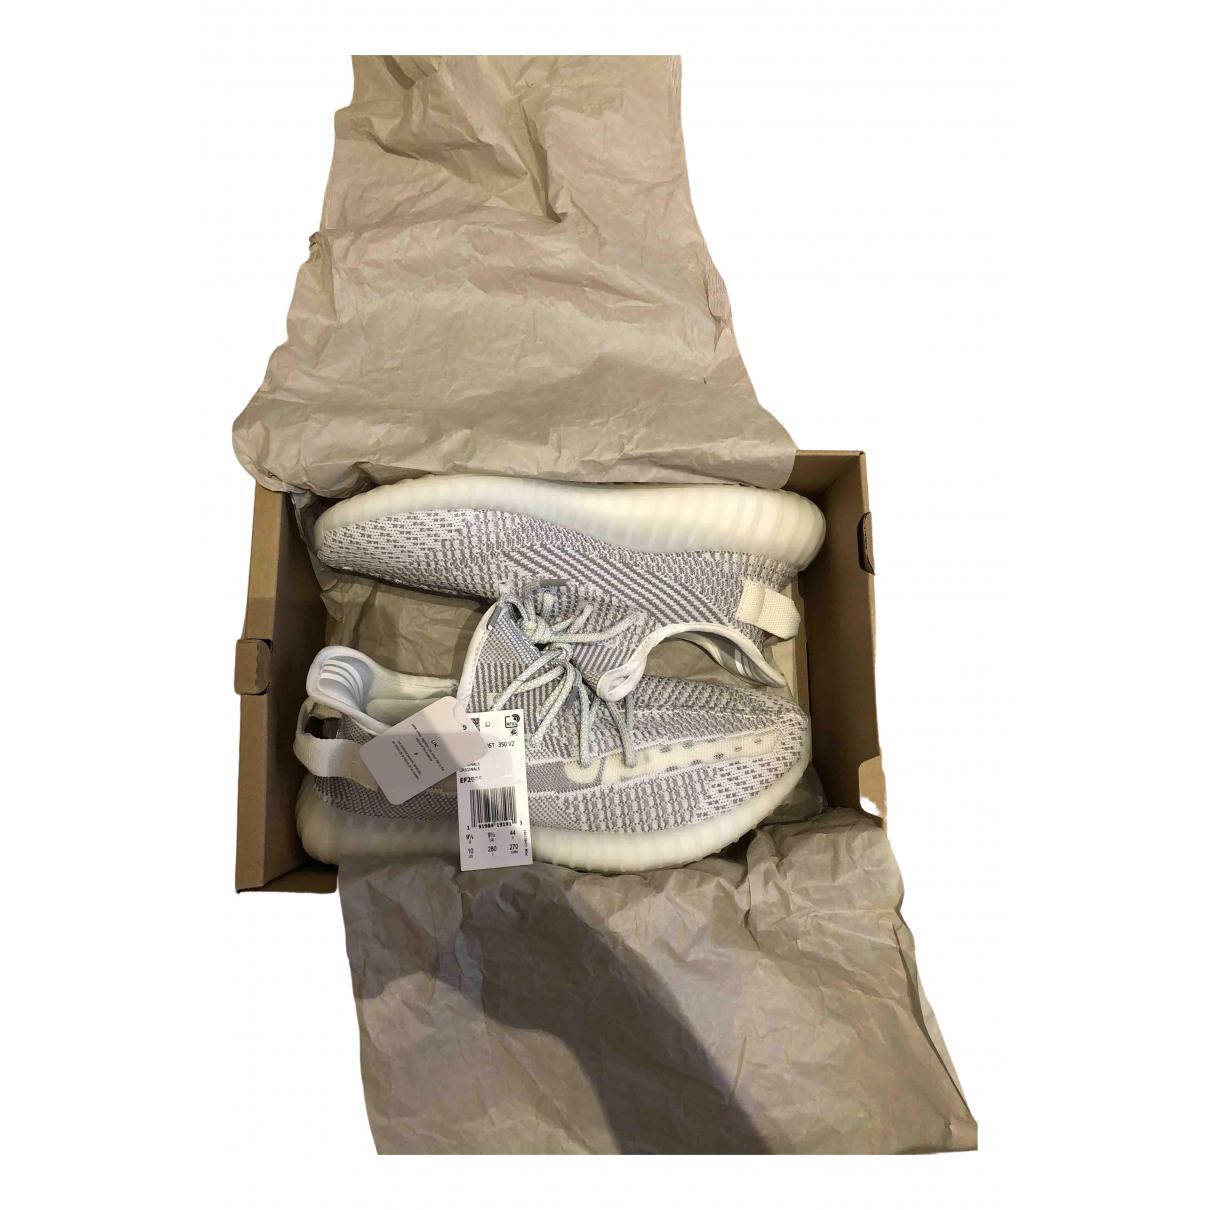 Yeezy X Adidas - Baskets Boost 350 V2 pour homme en toile - argente